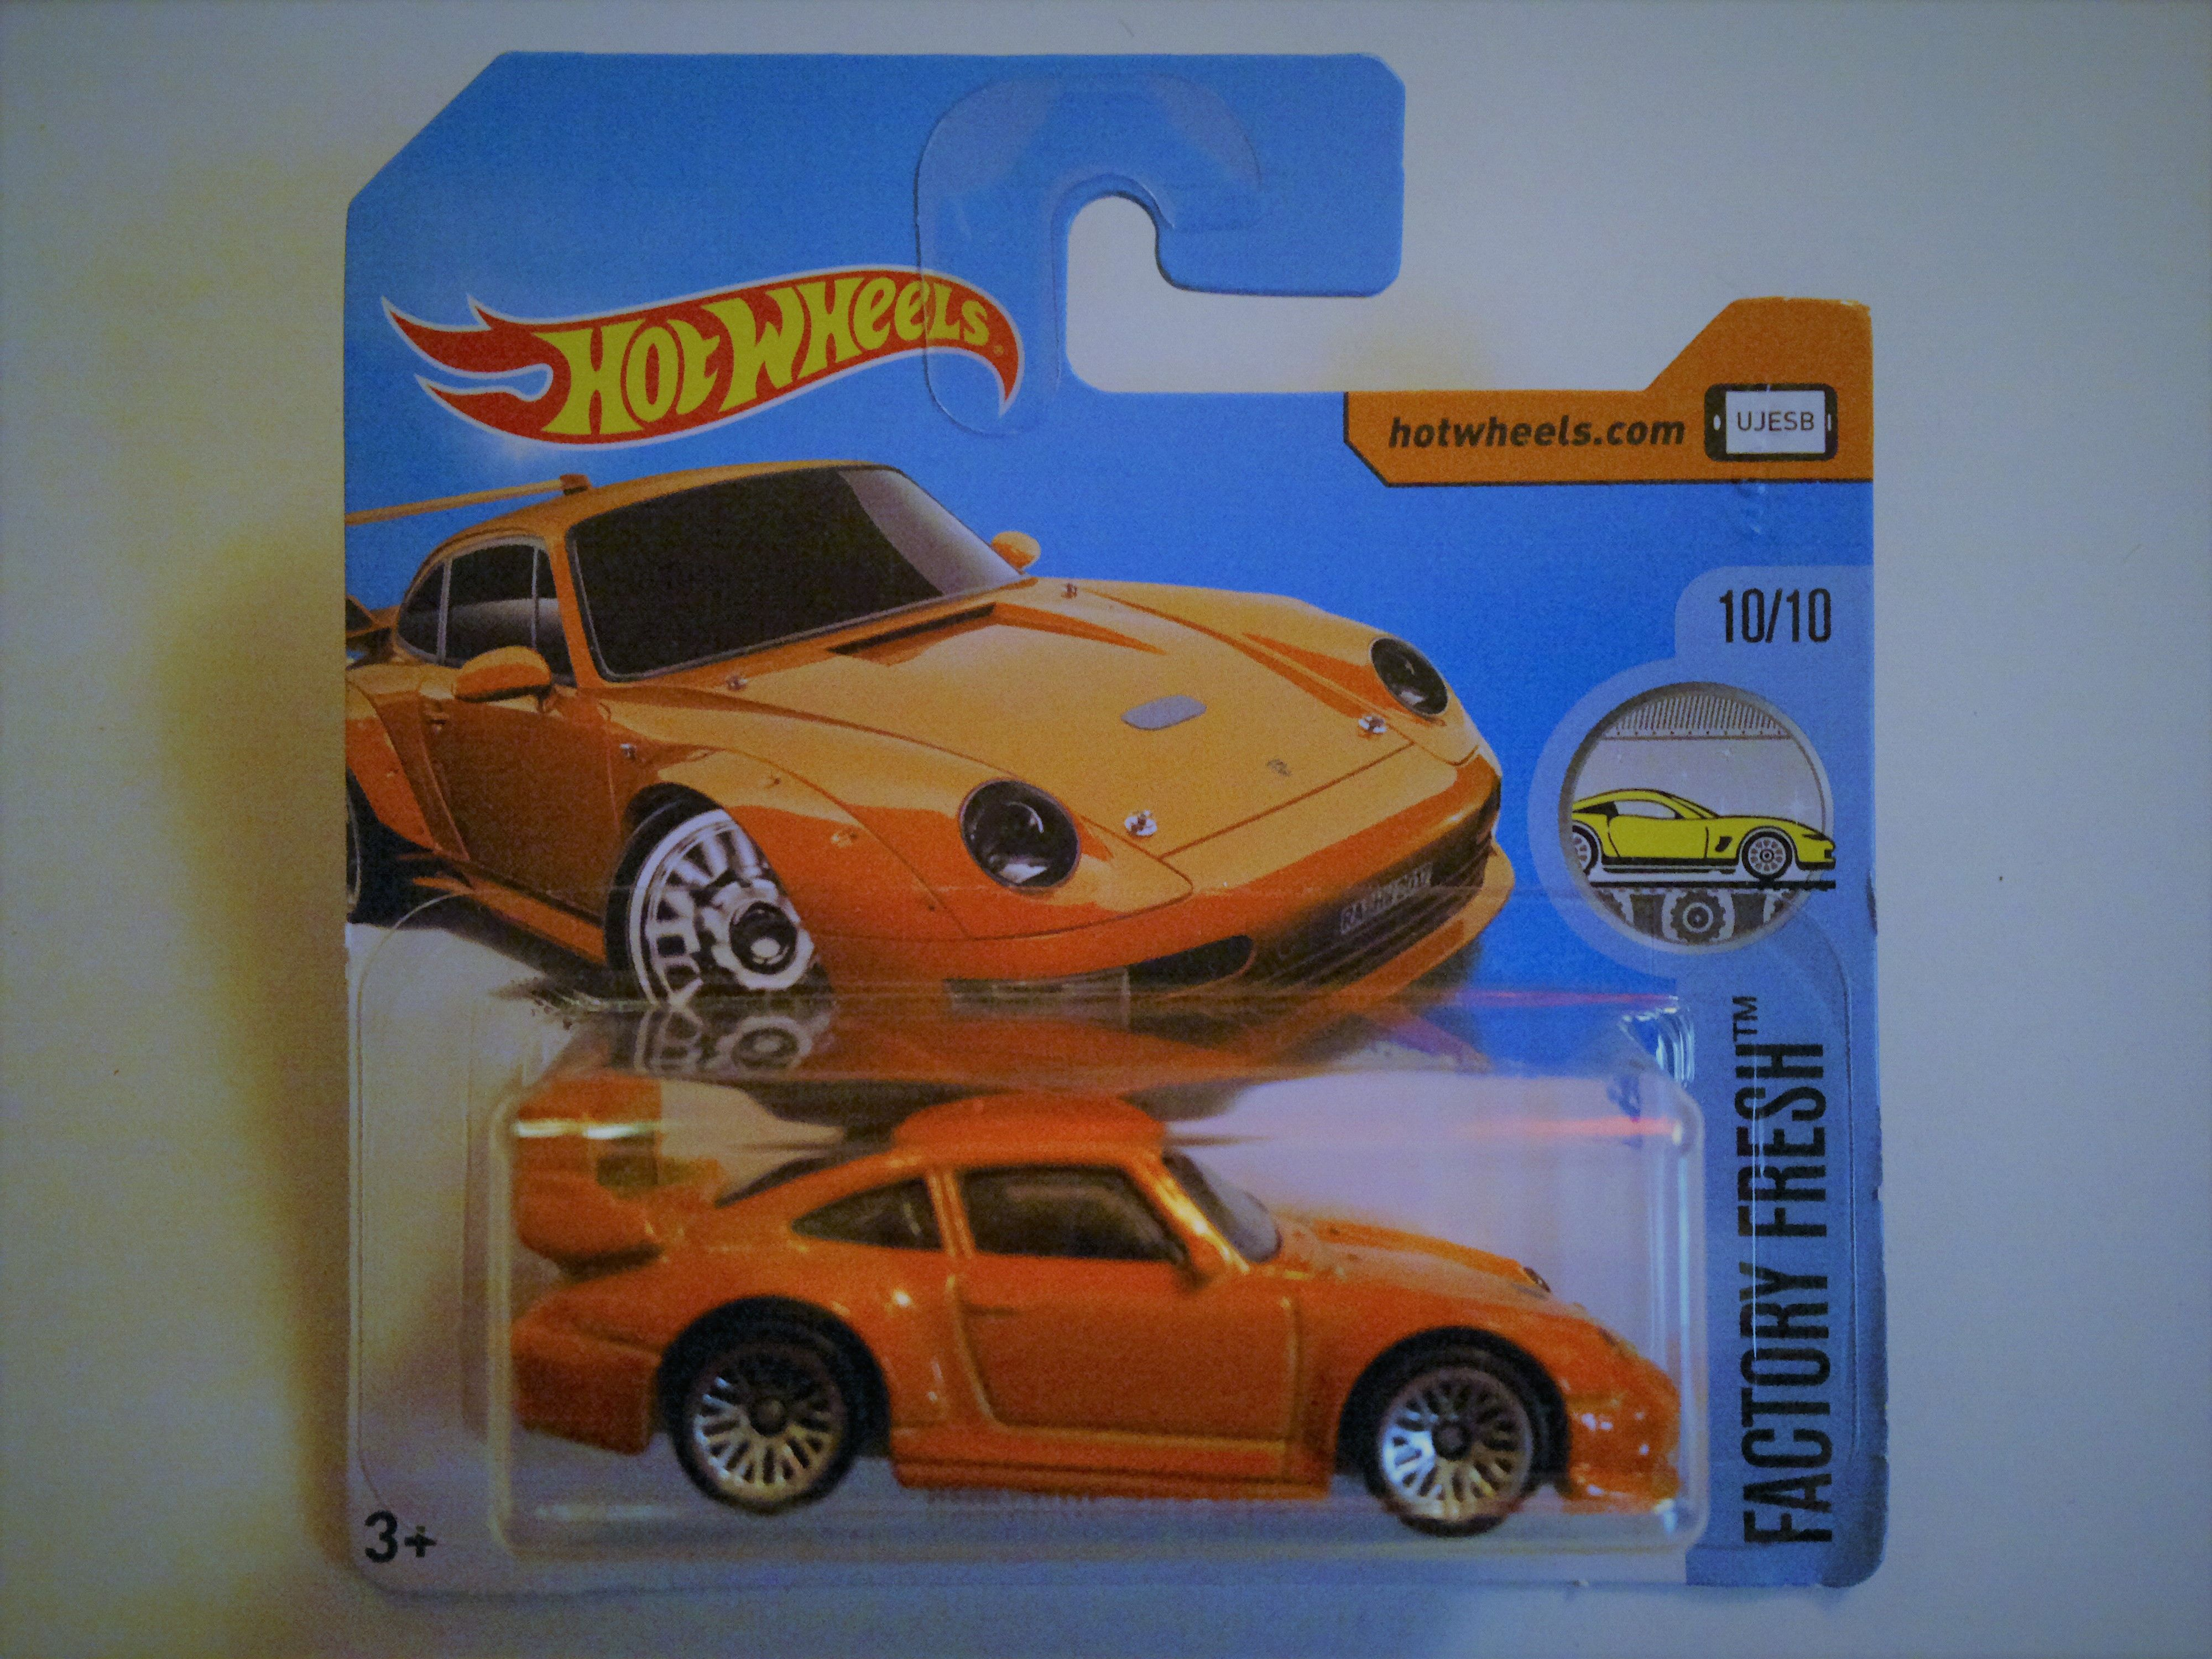 5b7e022745c038ea5d1baa8a5e0abe4a Outstanding Porsche 911 Gt2 Hot Wheels Cars Trend